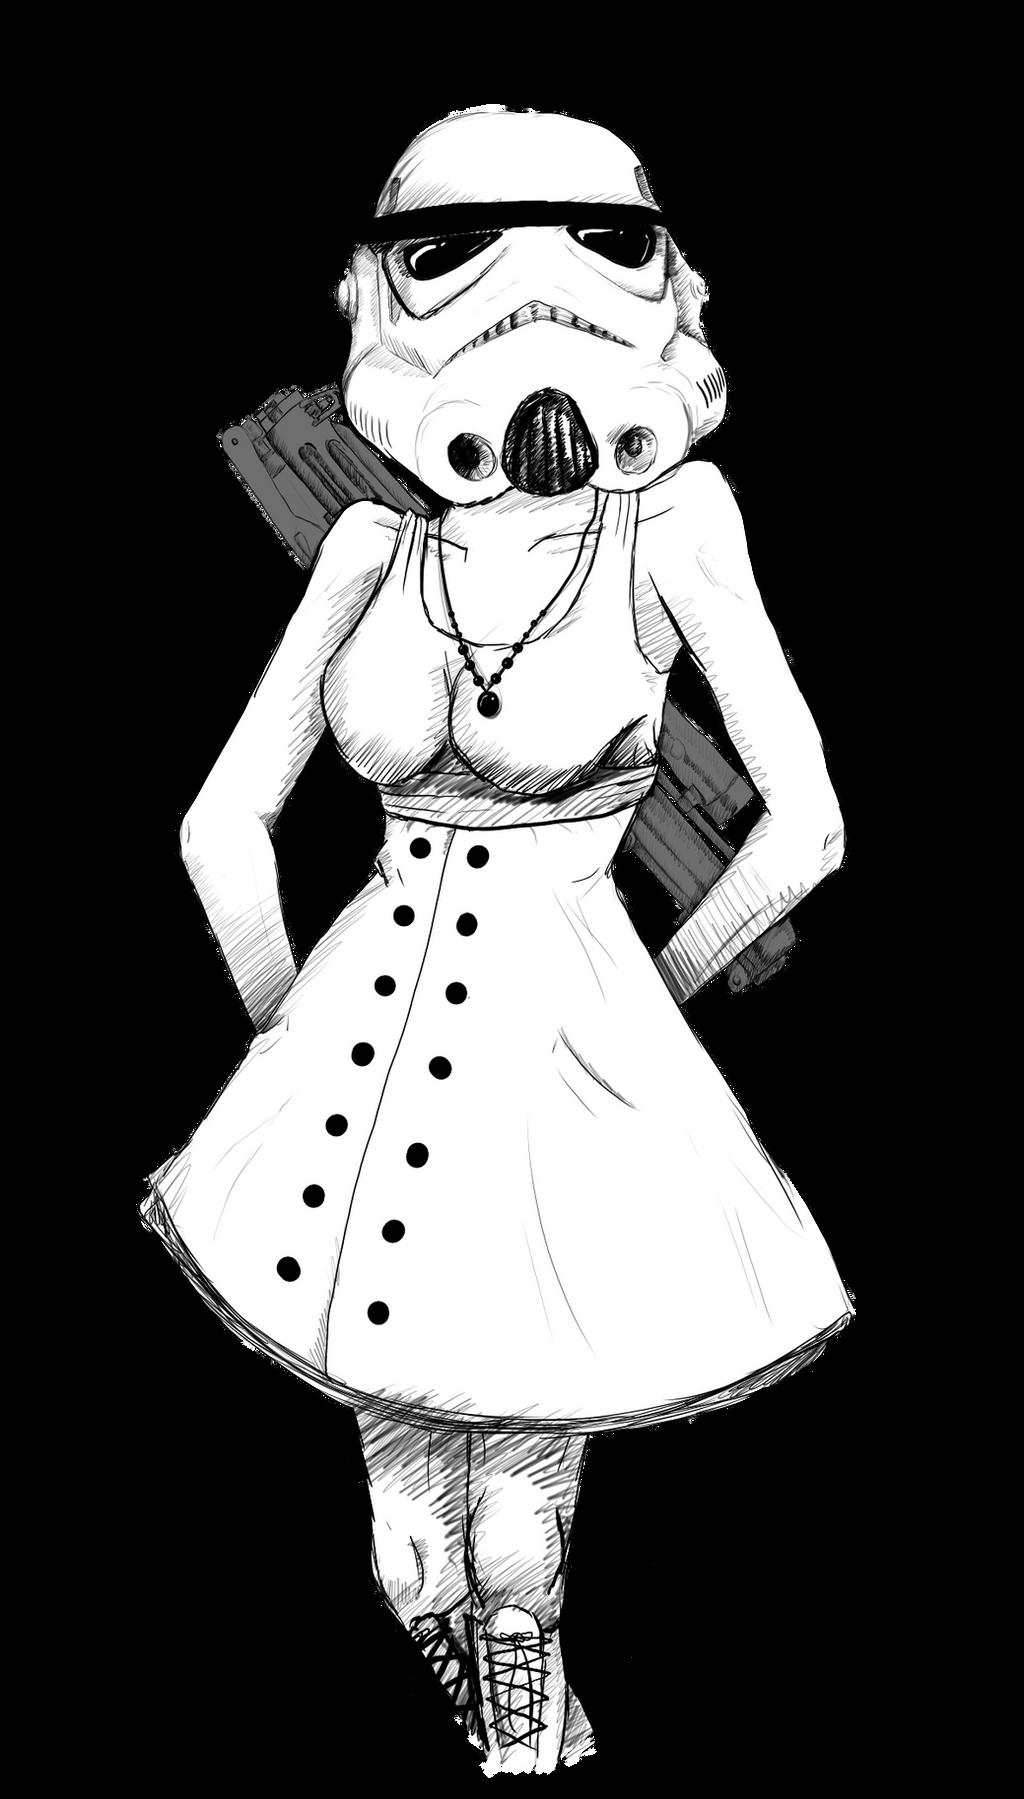 stormtrooper cutie sketch by sylunahirokashi on deviantart